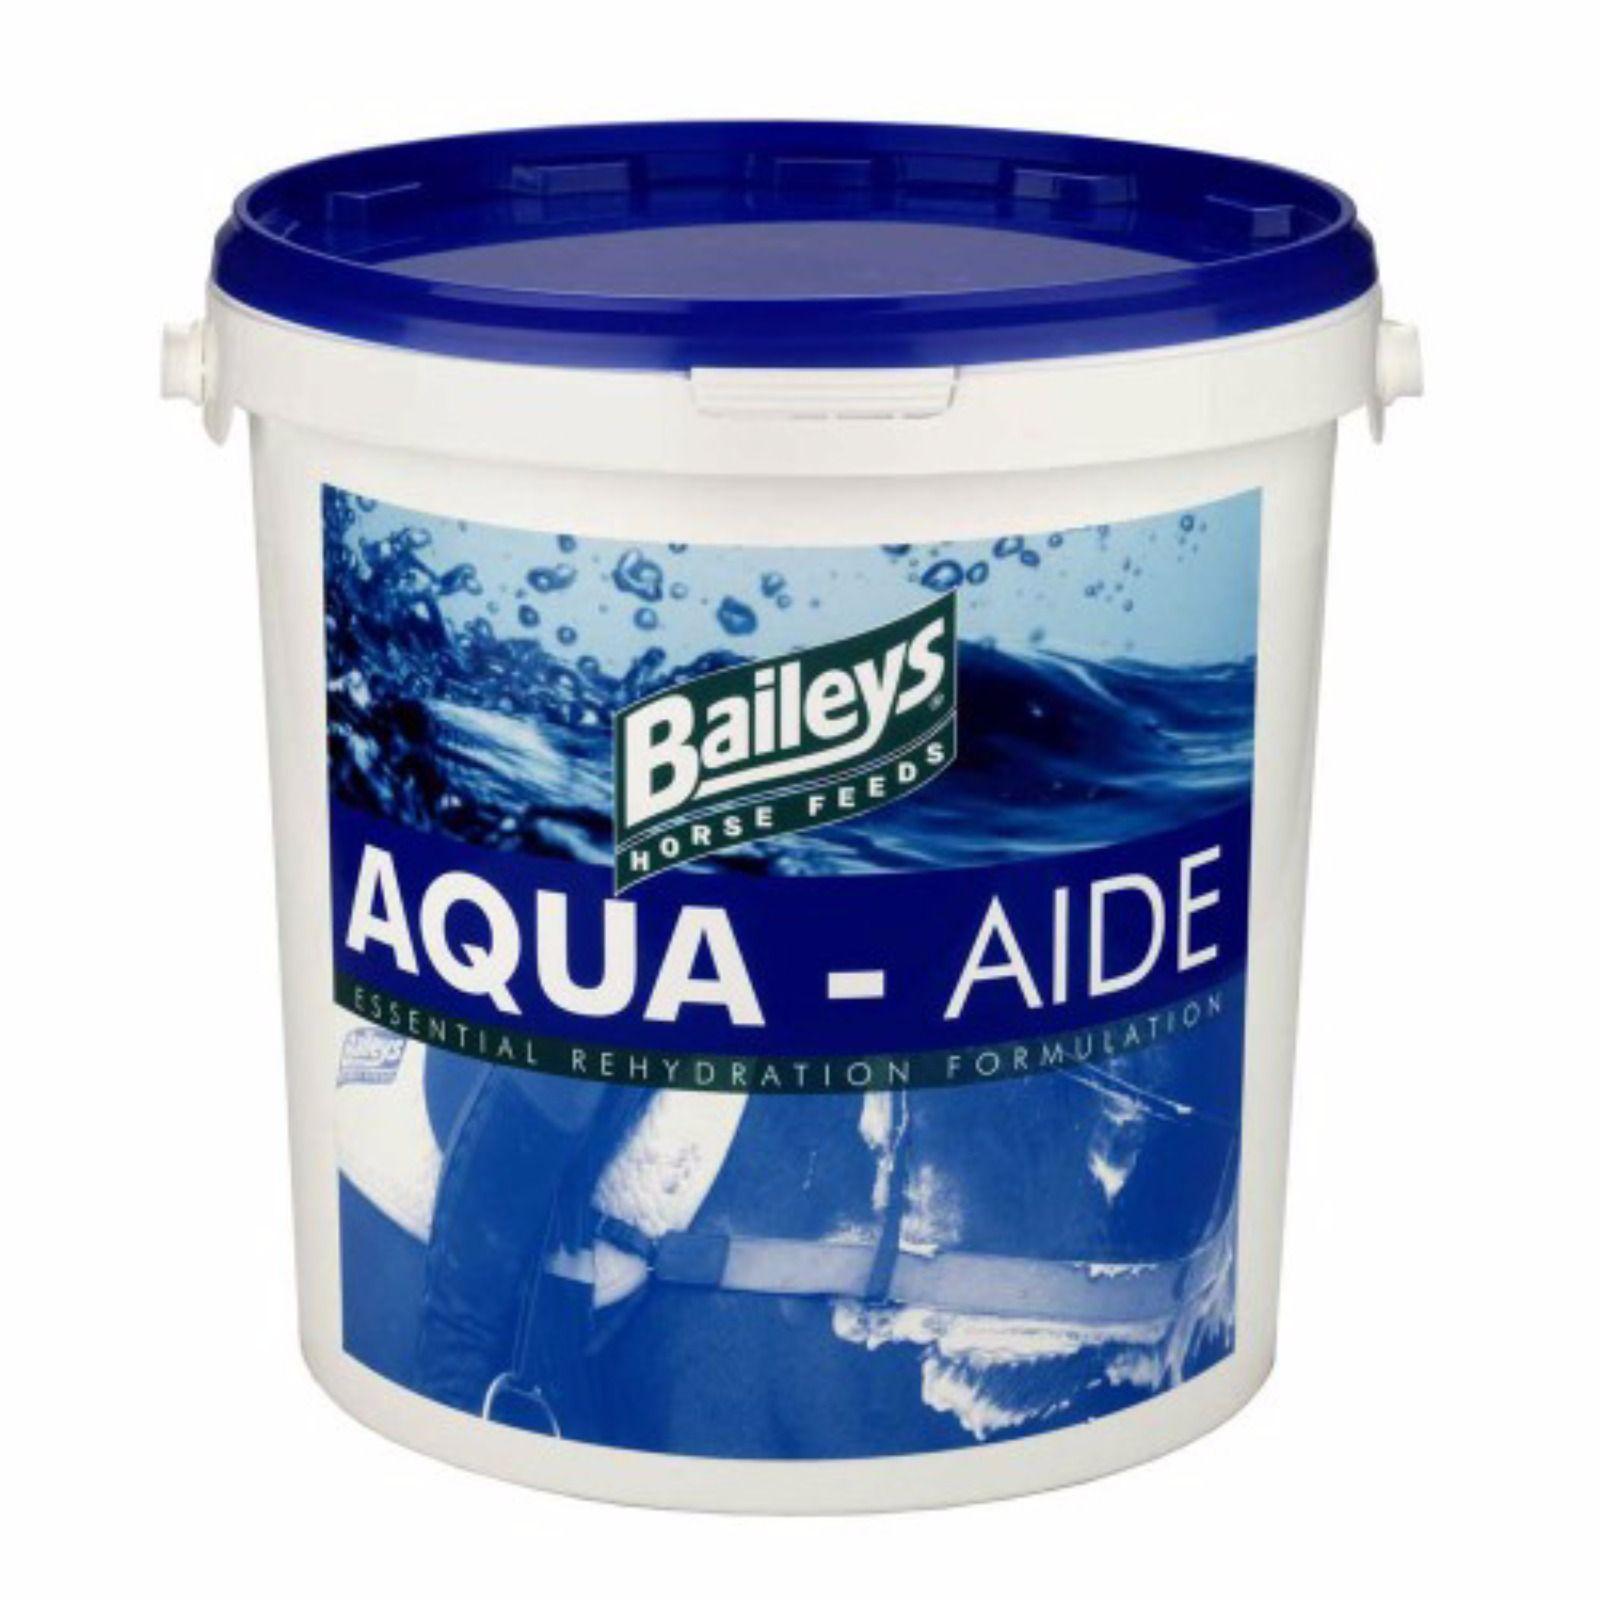 Baileys Aqua- Aide Electrolyte